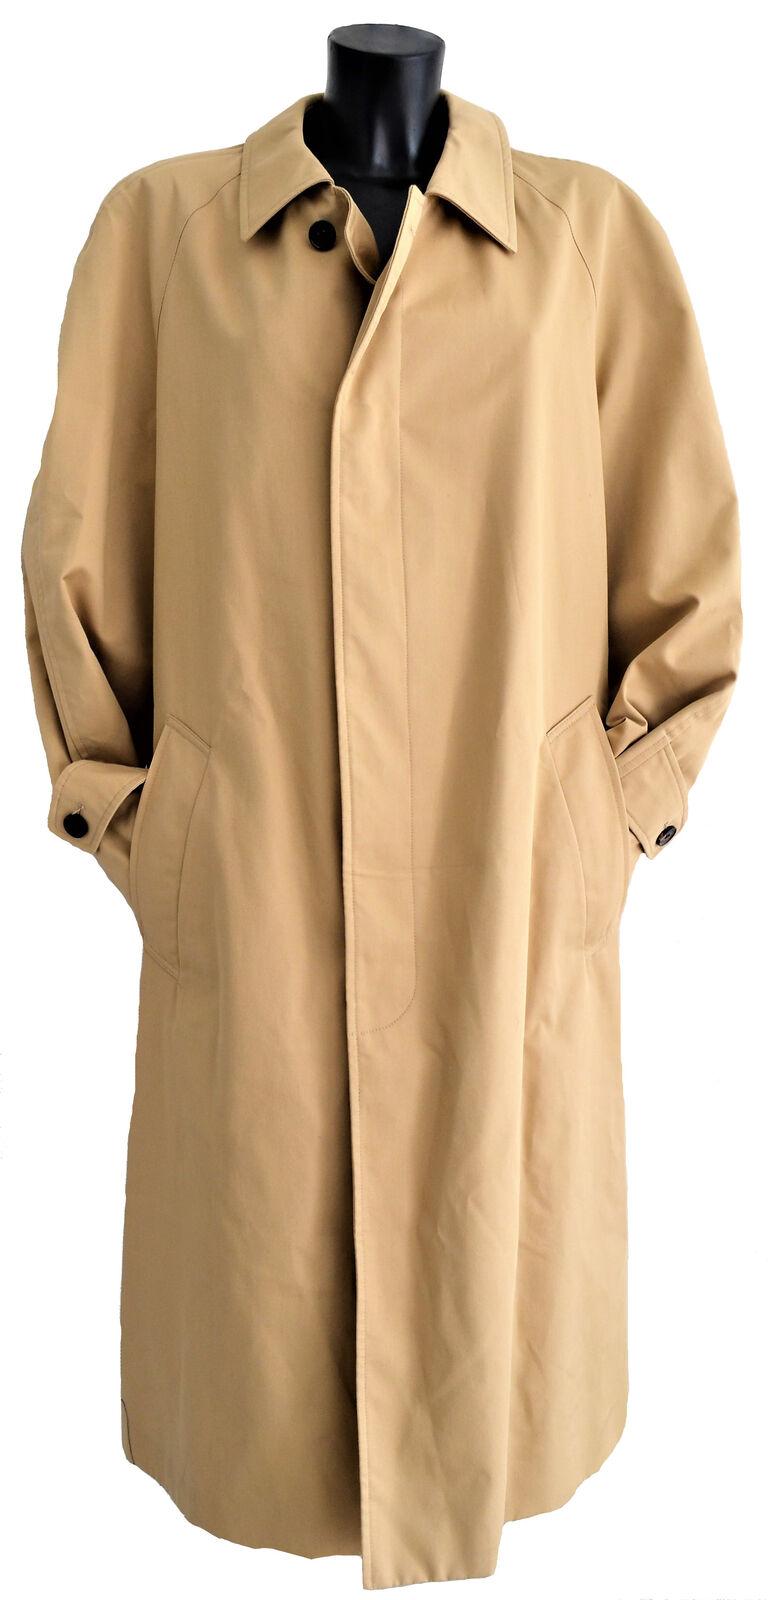 Giubbotto Jacket Aquascutum London Giacca Trench Beige Uomo Man Jacket Giubbotto 68674b